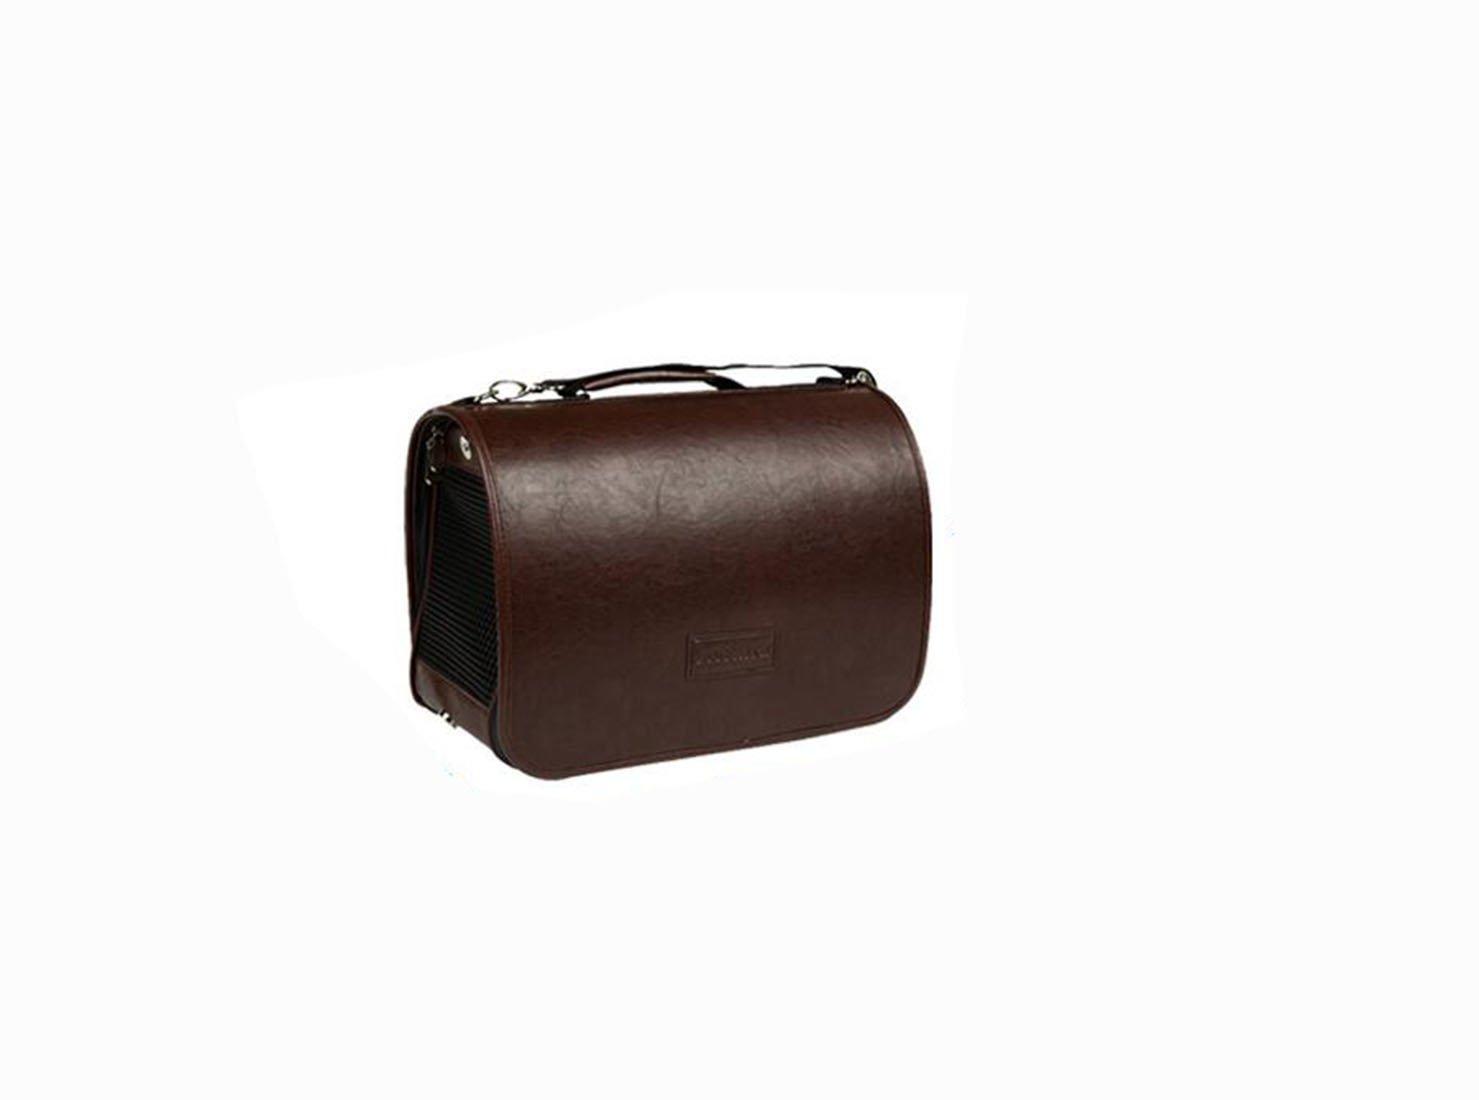 Alkem Luxury Faux Leather Pet Dog Cat Travel Carrier Tote Bag Portable Handbag Shoulder Bag (Small)